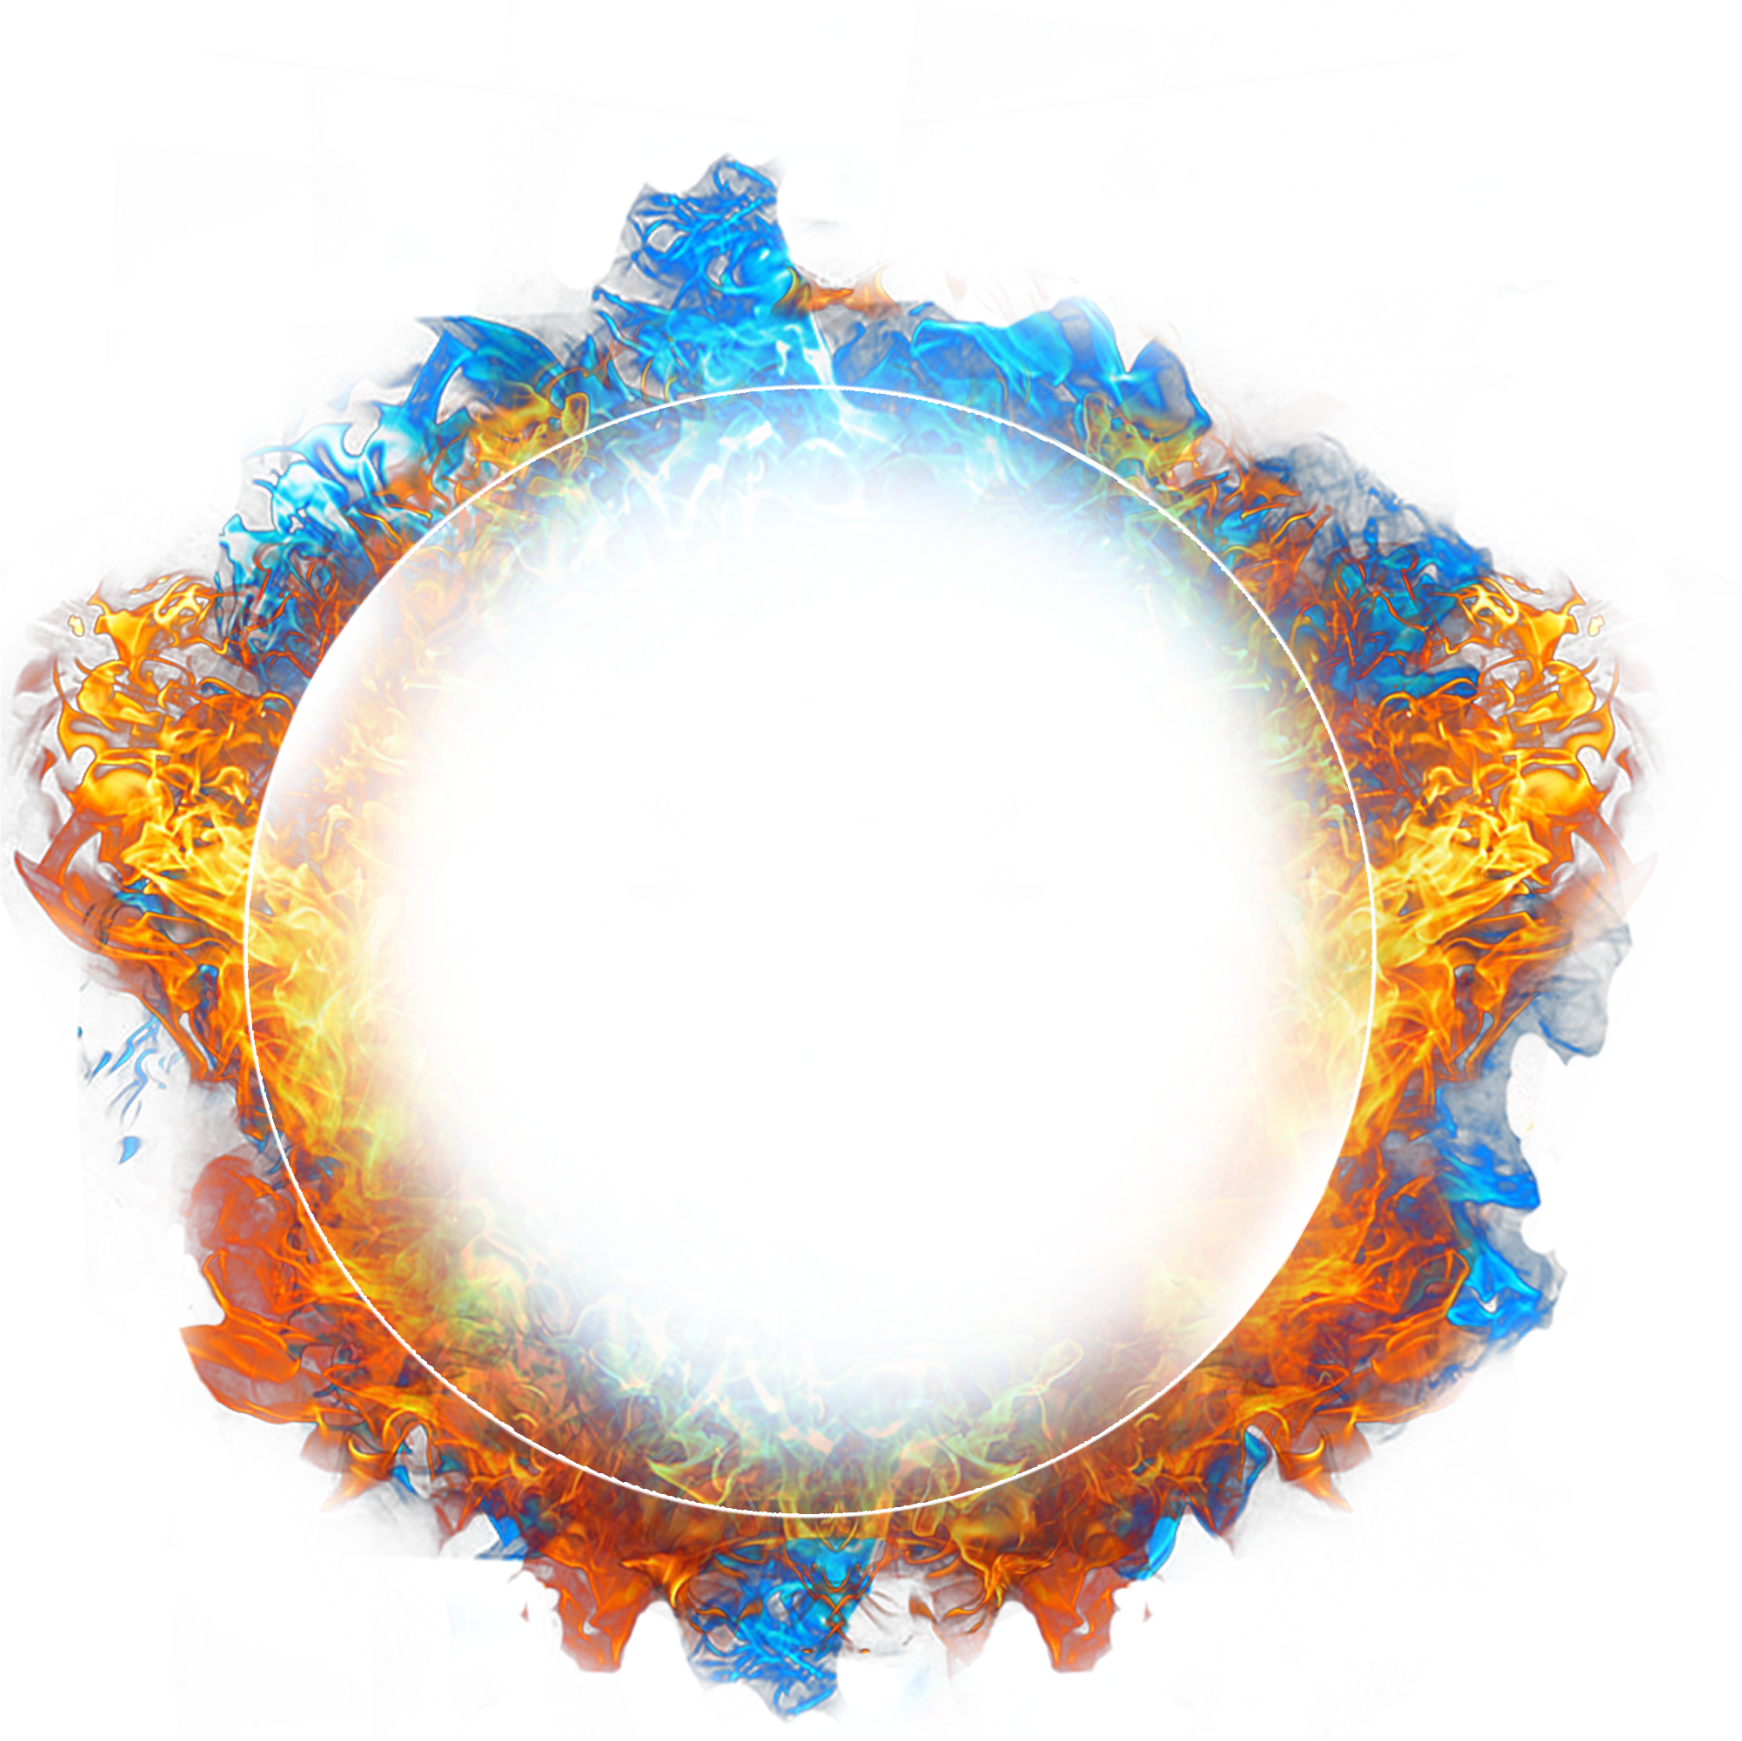 Crystalball Frame Mirror Magic Smoke Freetoedit Effect.